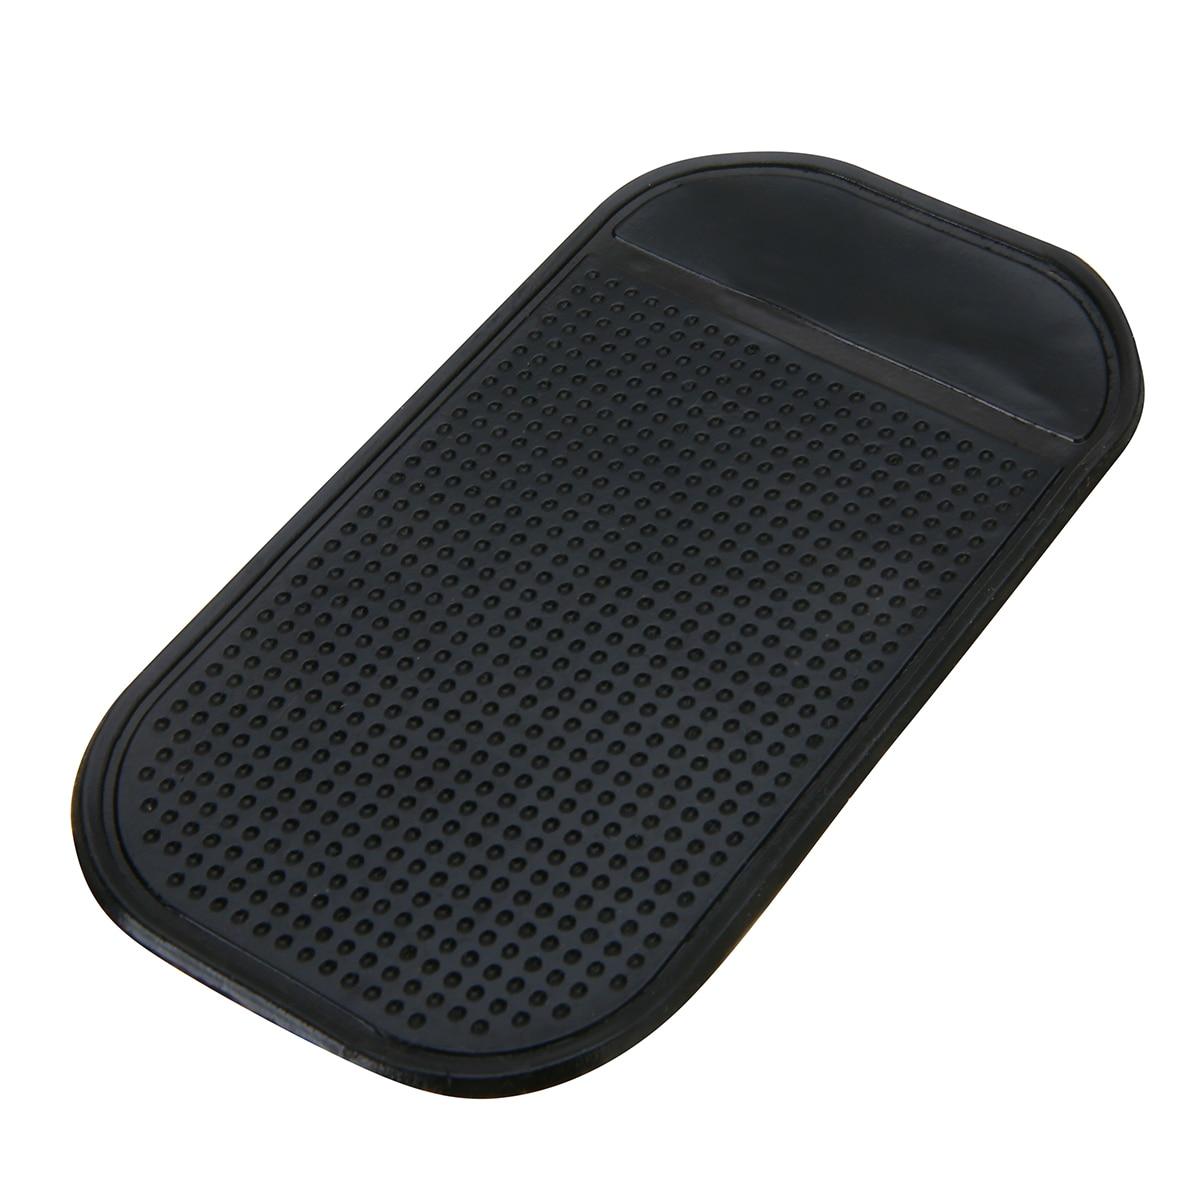 5pcs Rubber Non Slip Mat Car Dash Anti Universal Holder Pad Skid For Phone Keys